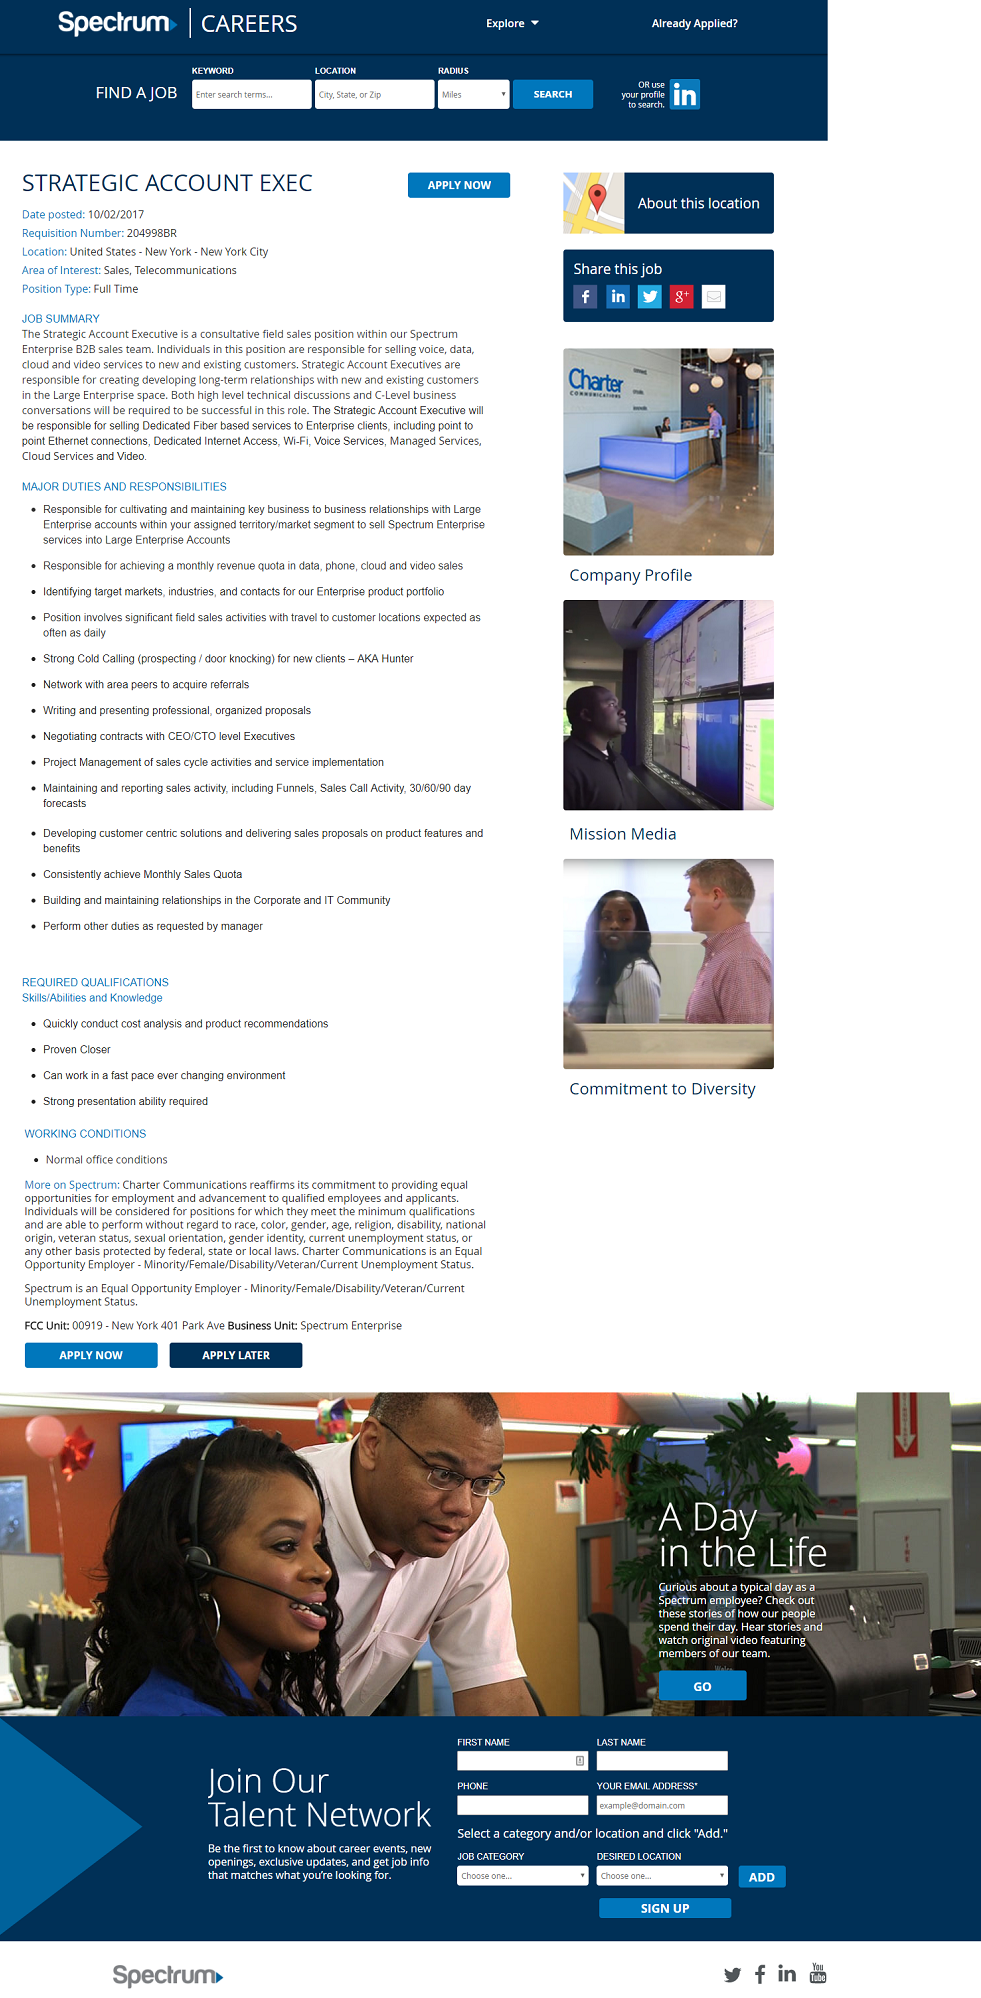 Spectrum Kenexa Brassring ATS Job Page